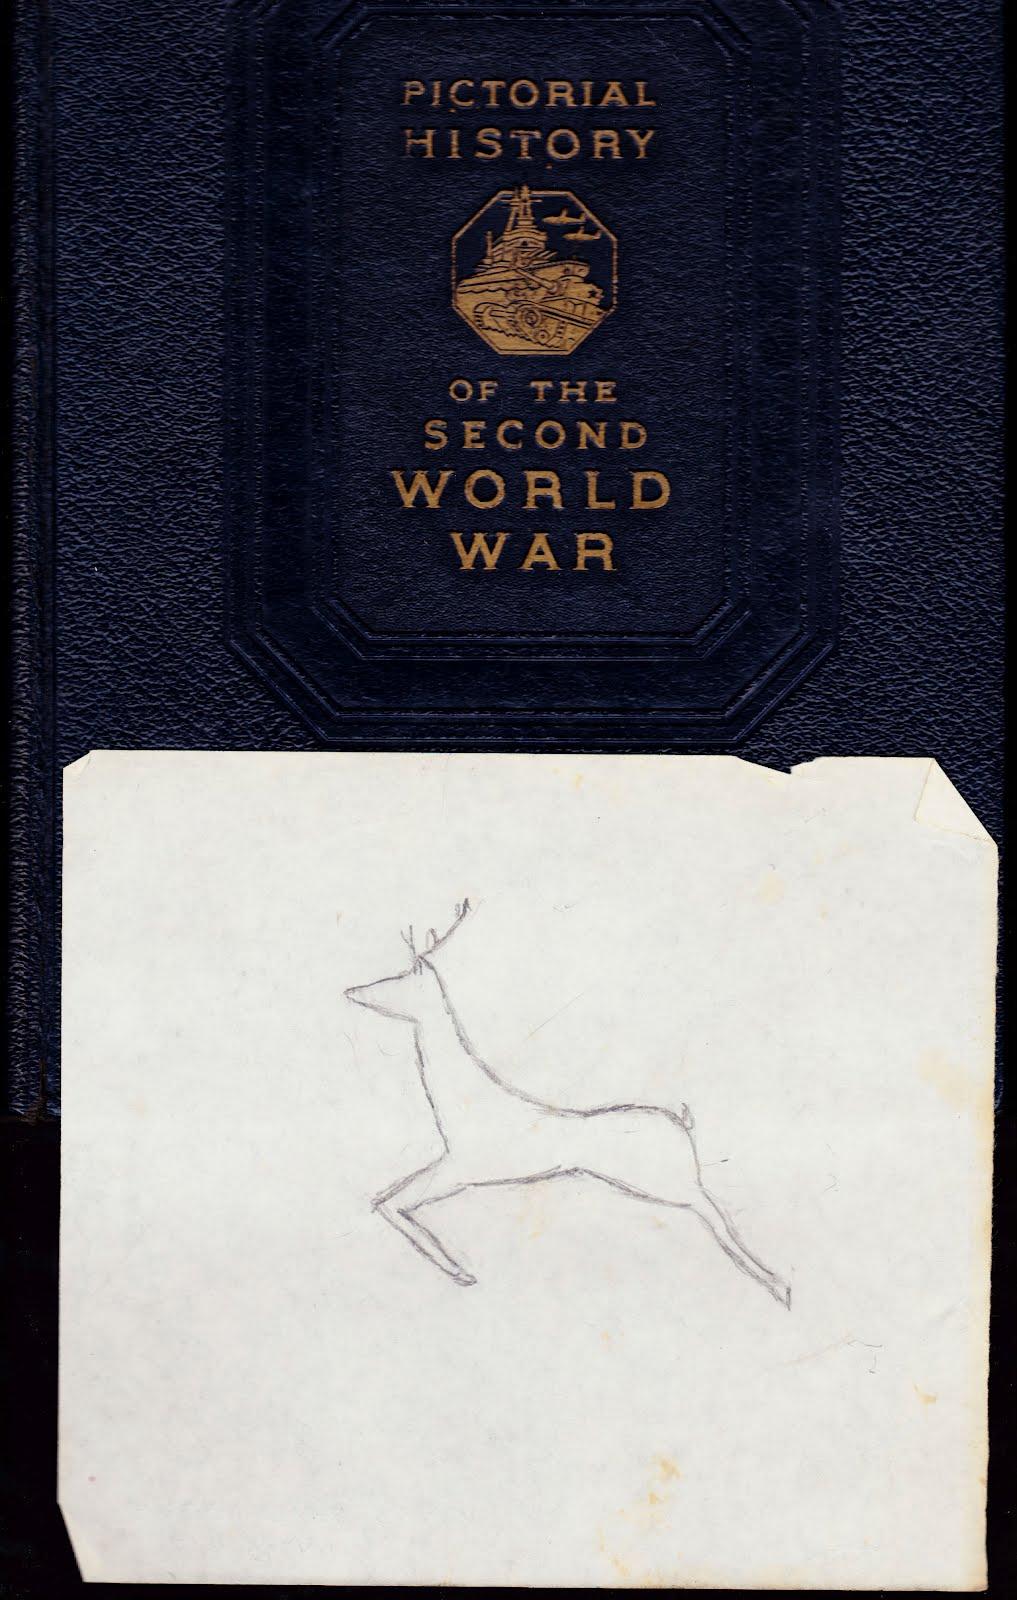 1017x1600 Papergreat Deer Drawing Inside A World War Ii History Book